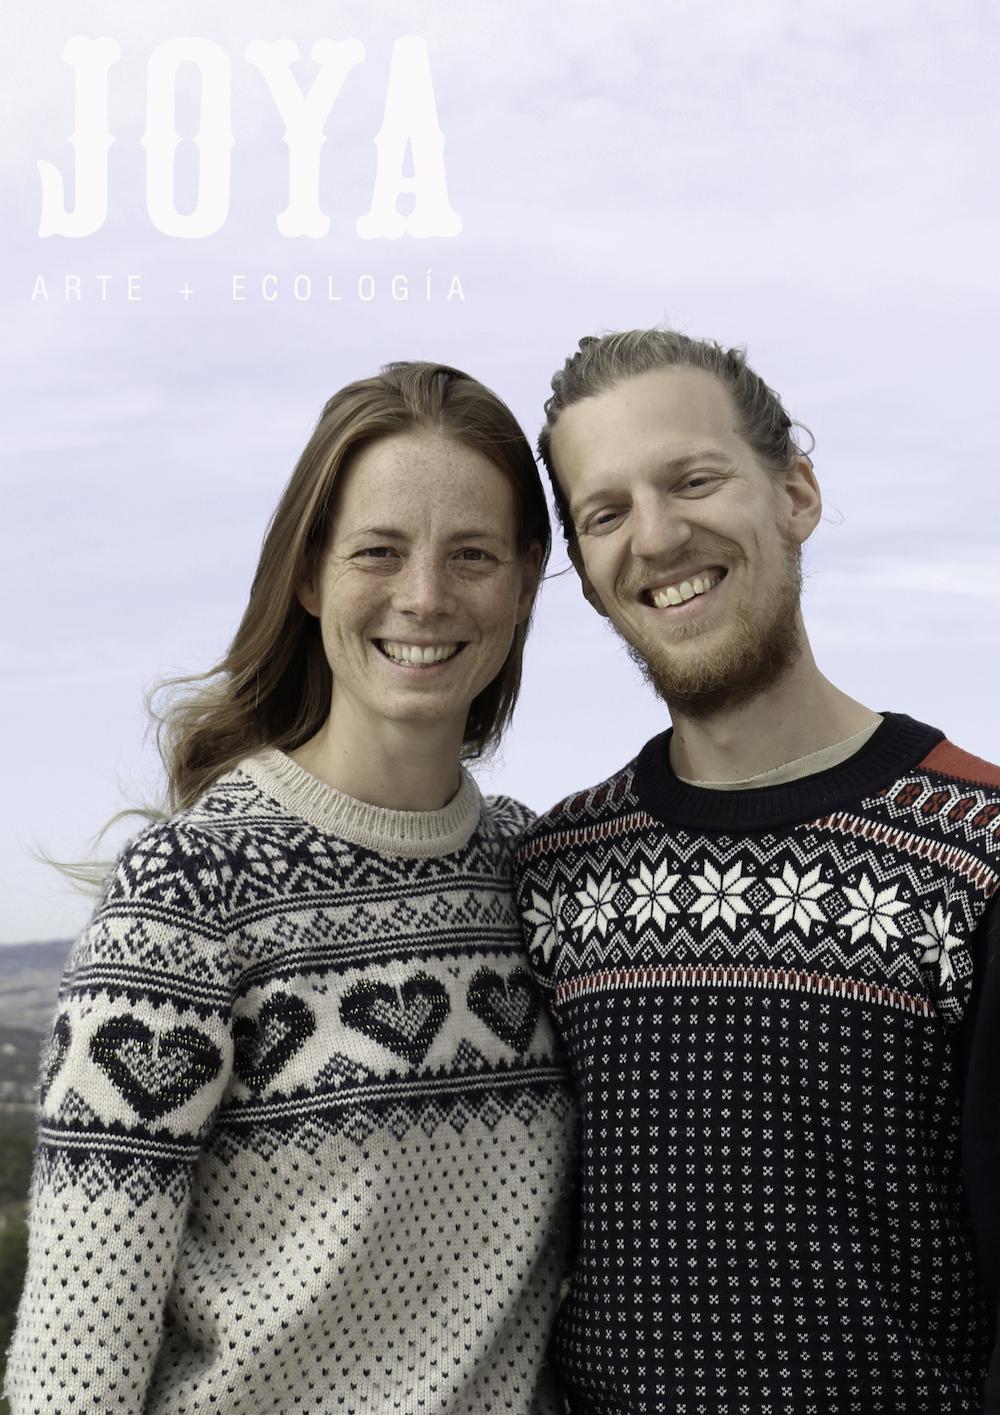 austrians-copy.jpg